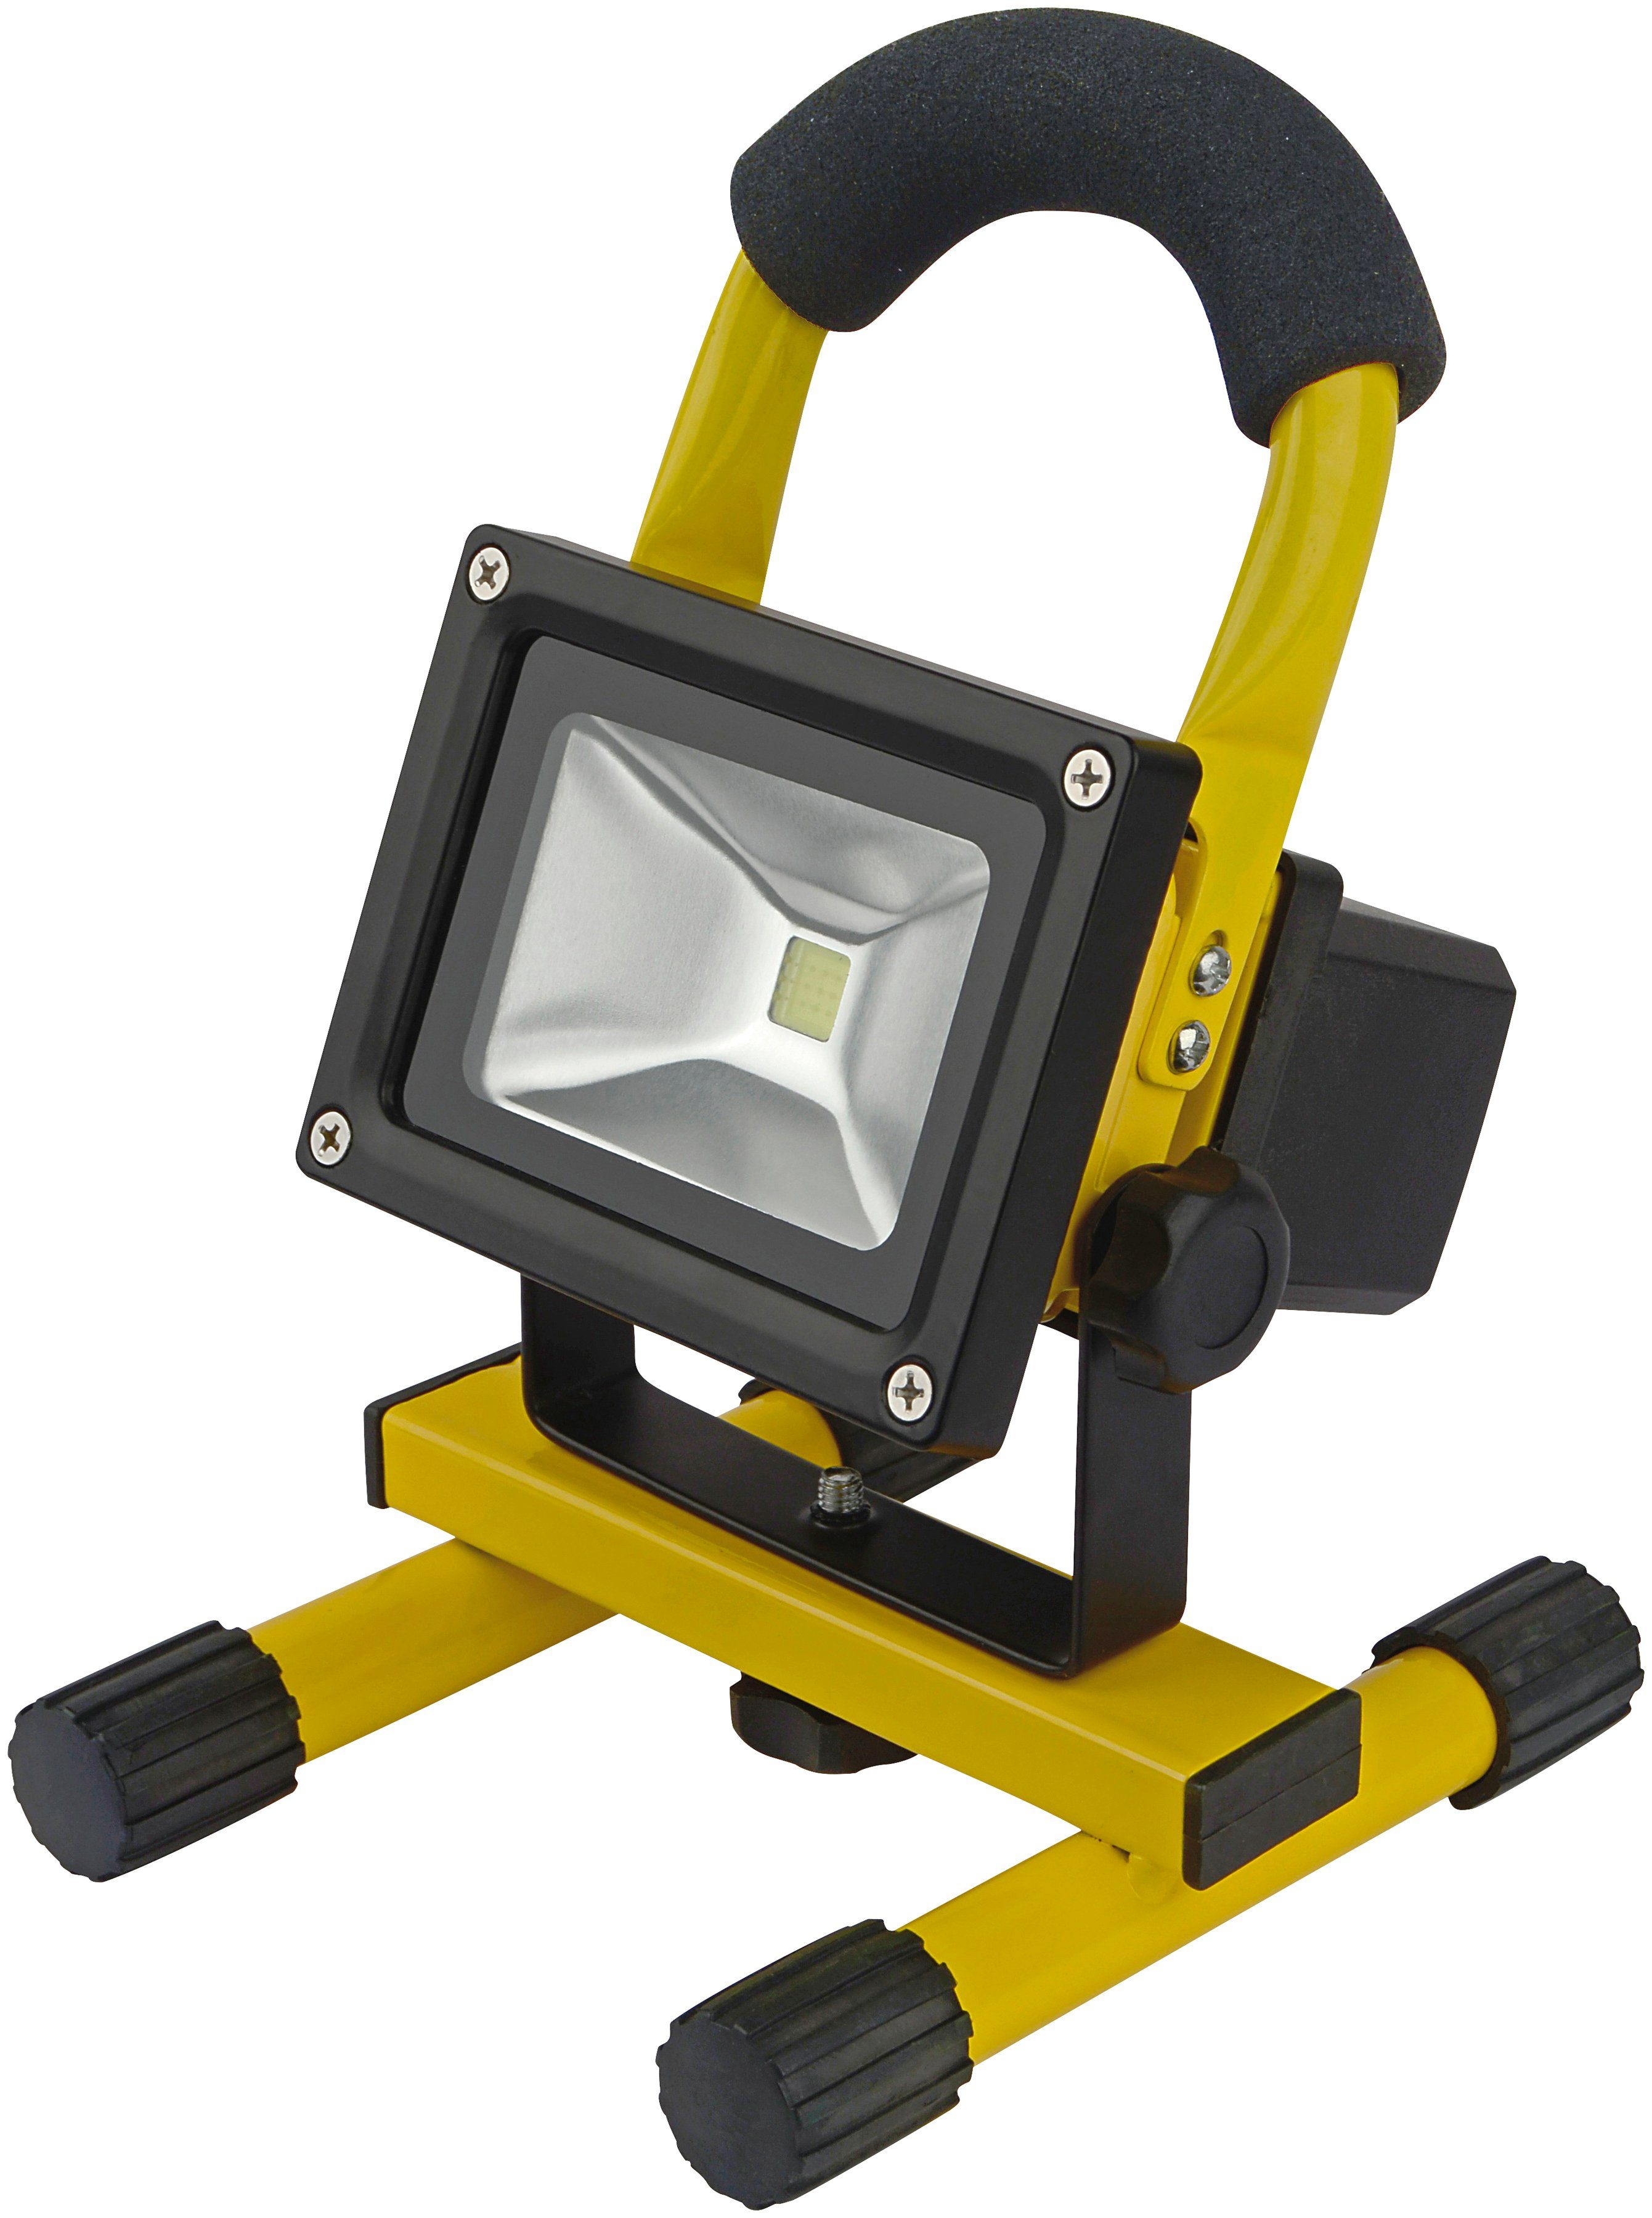 Brueder Mannesmann Werkzeuge LED-Strahler »Akku«